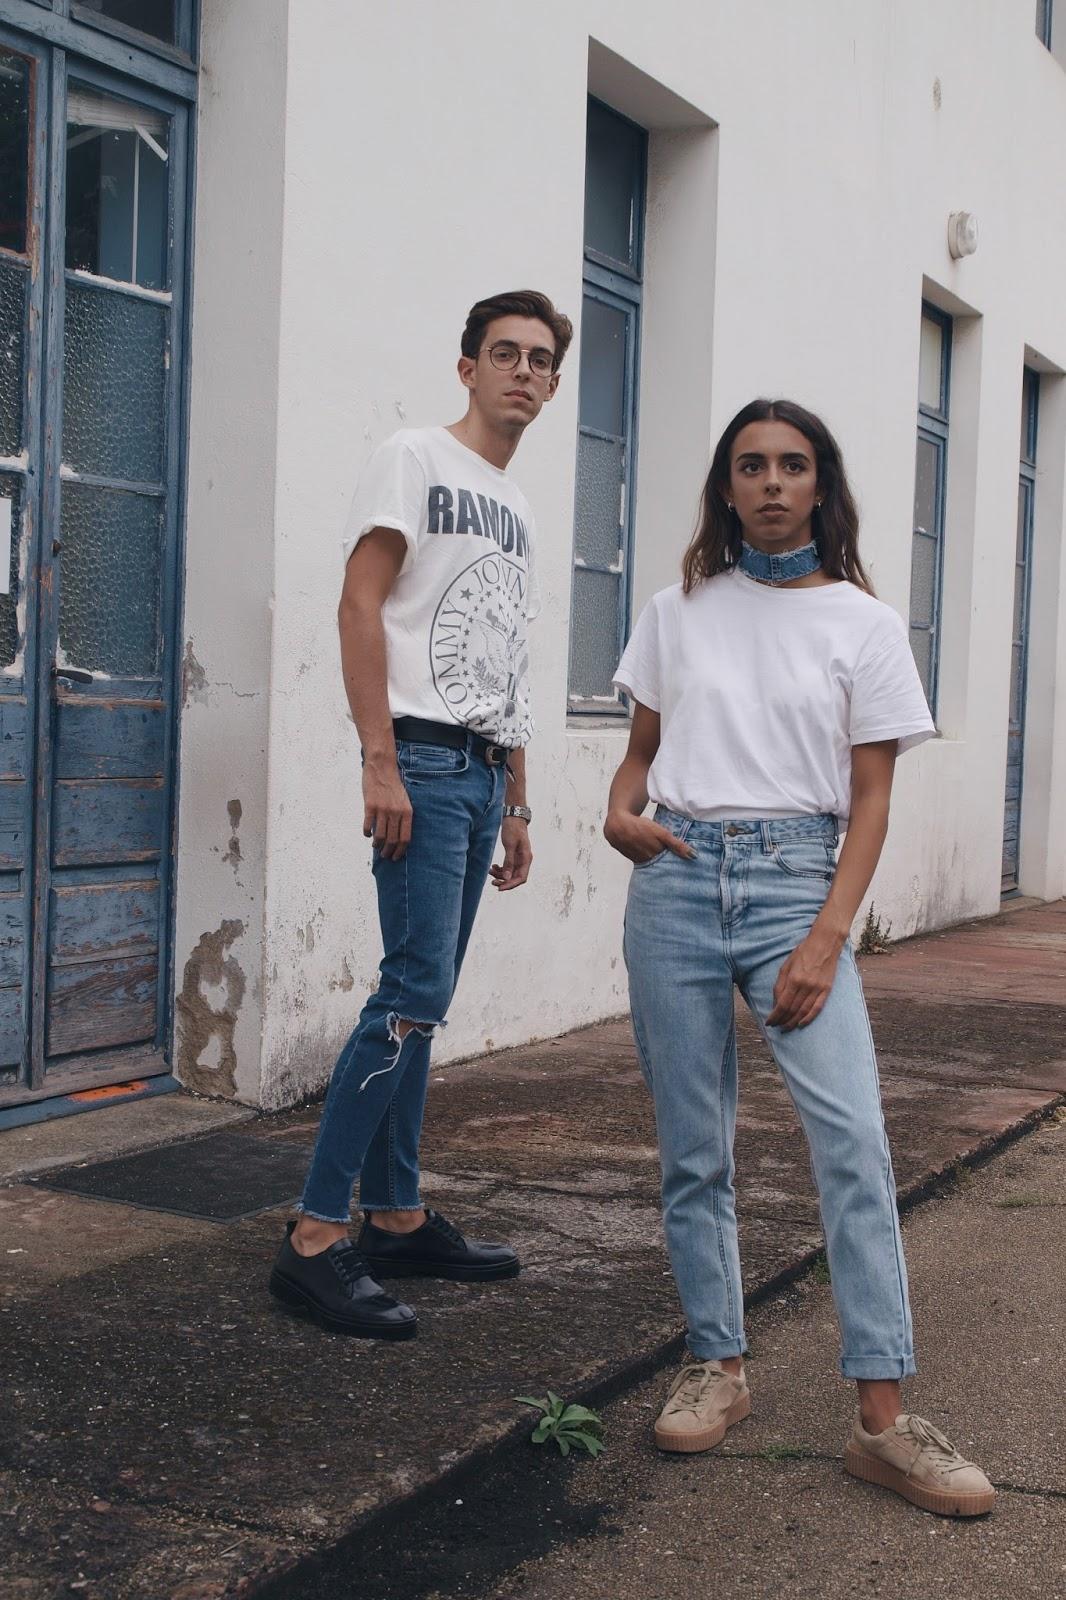 Rock-tee-tshirt-ramones-metallica-h&m-fashion-man-jean-suede-jacket-blog-coastalandco-hendaye 10